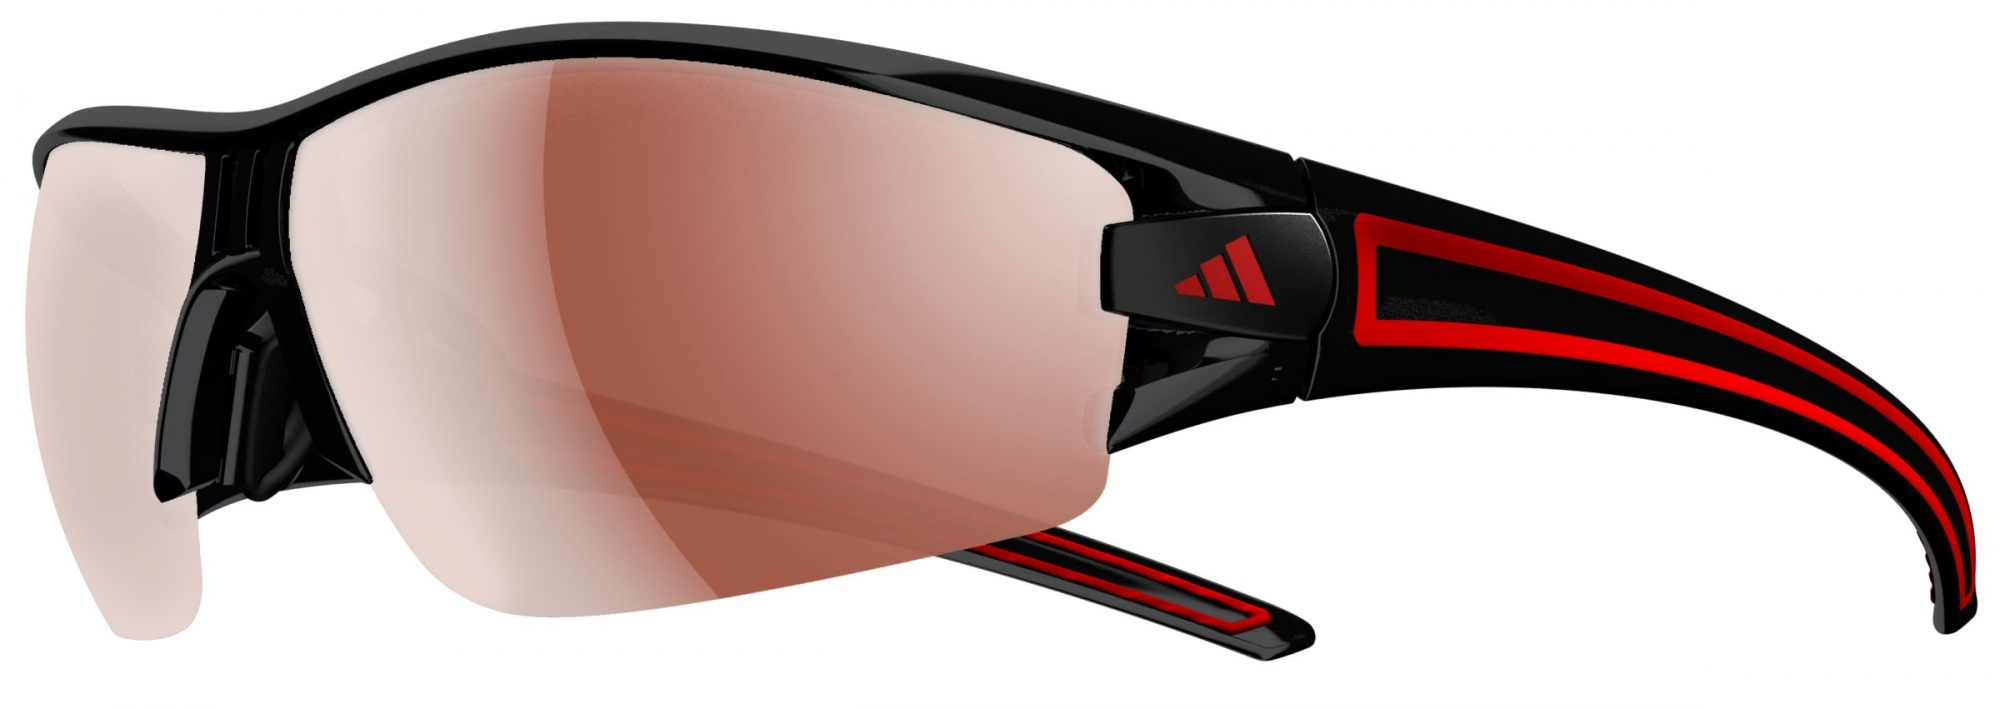 Image of   Adidas Eyewear Evil Eye Halfrim Solbriller - Shiny Sort / Rød